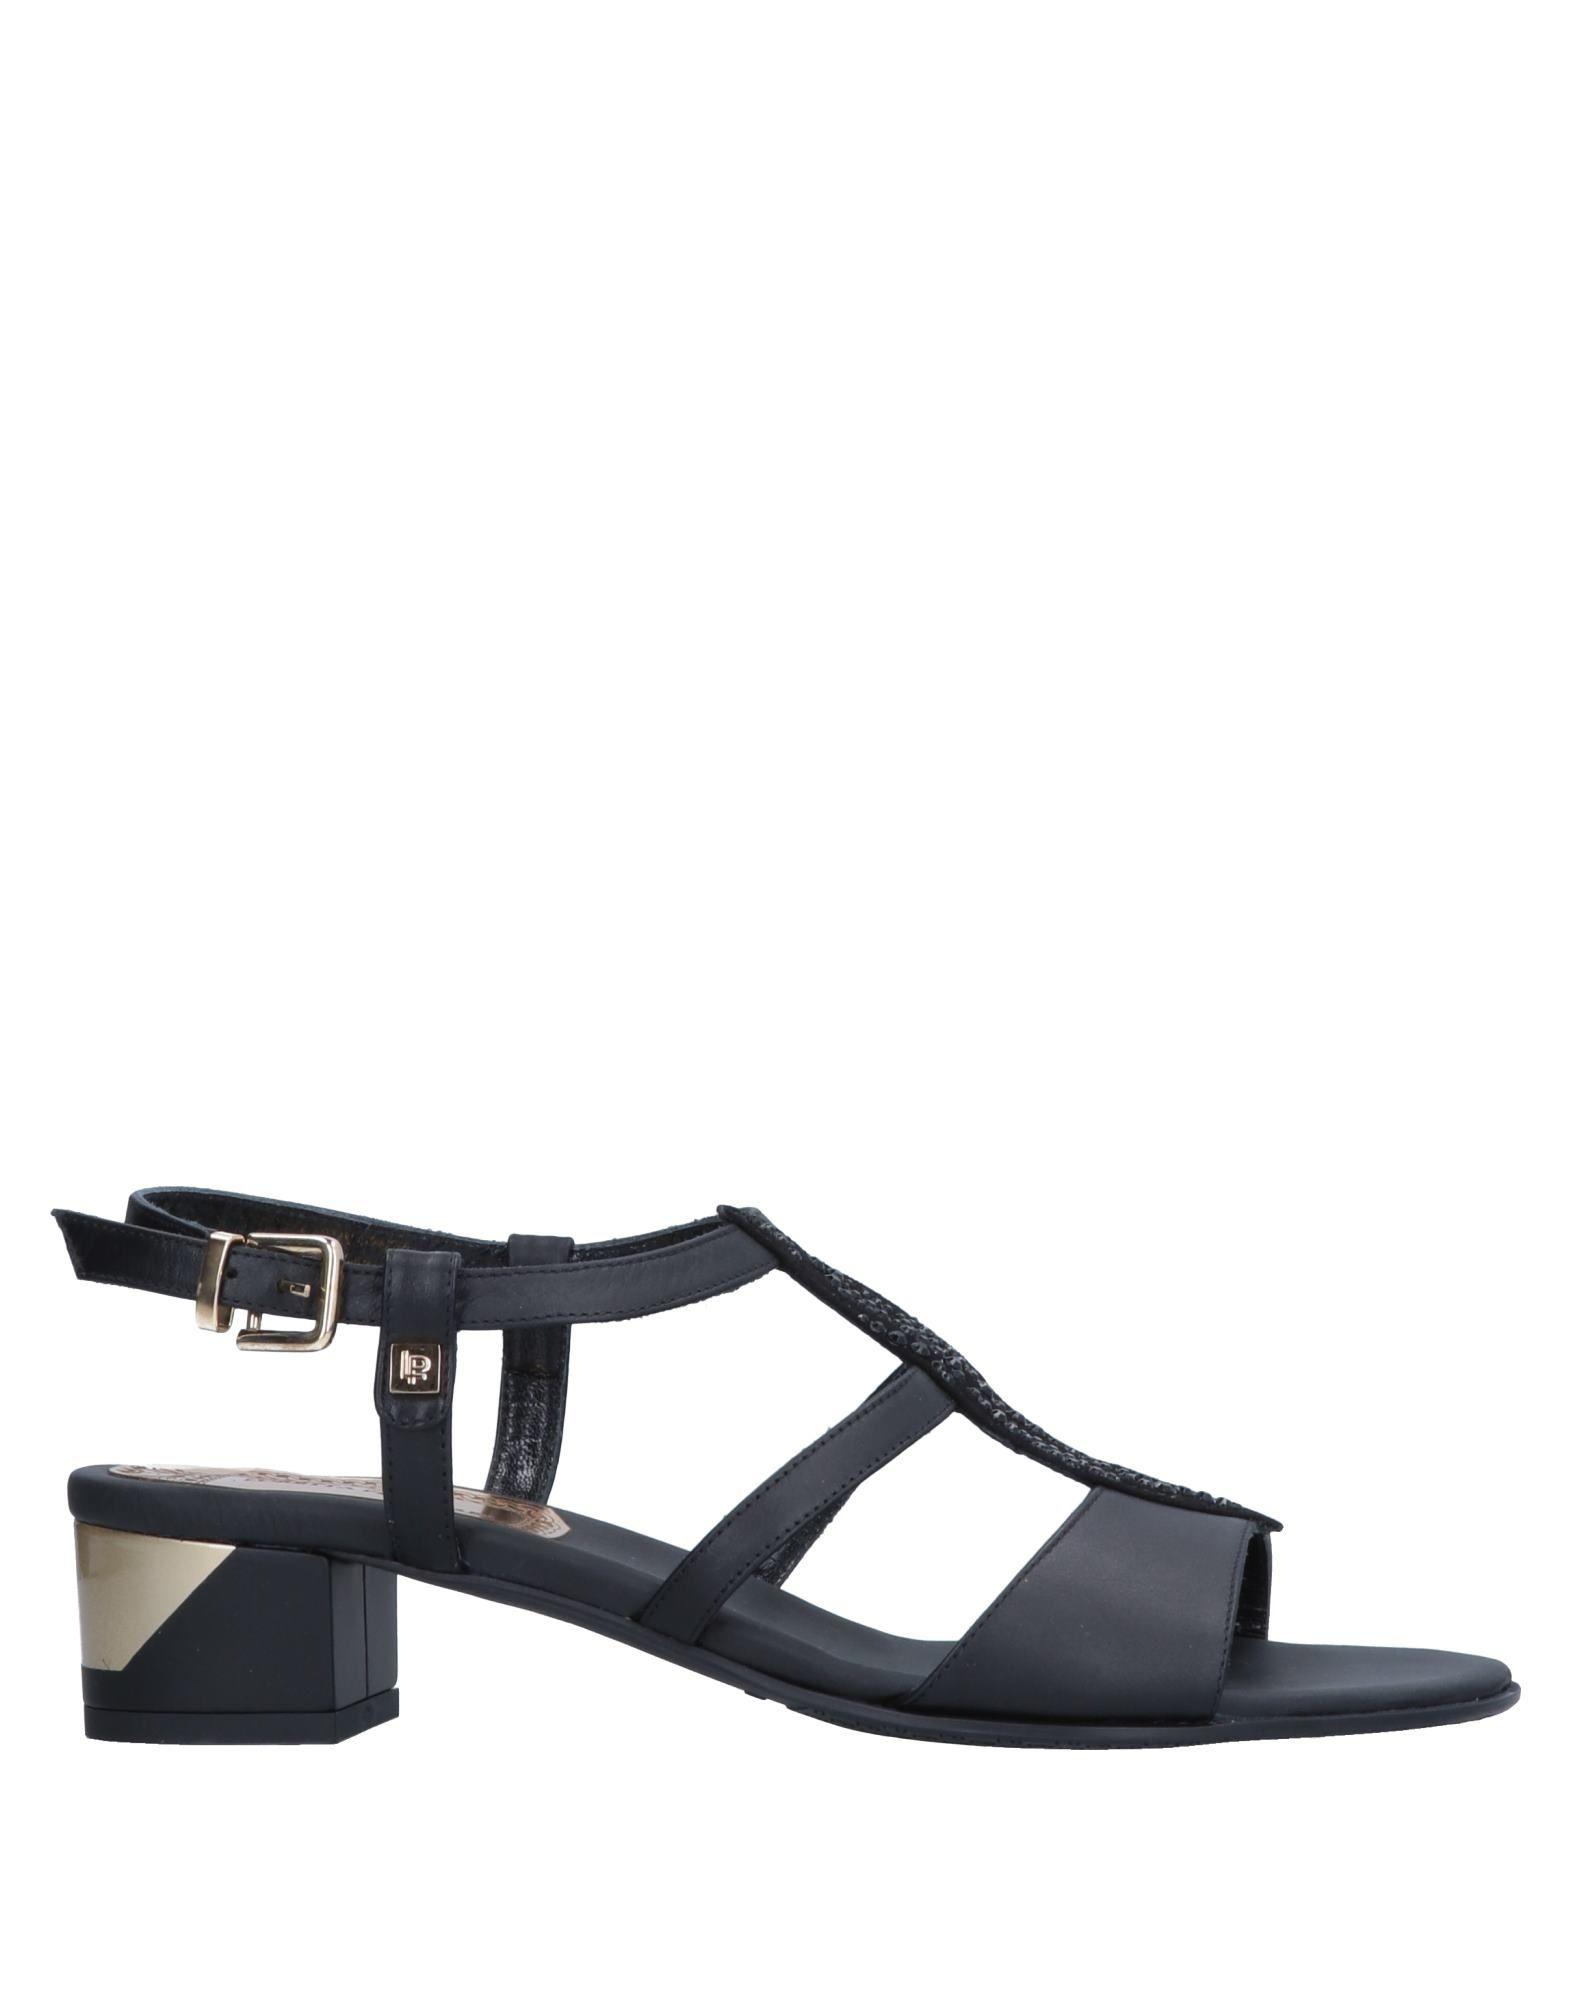 Loretta Pettinari Sandalen Damen  11550105EB Gute Qualität beliebte Schuhe